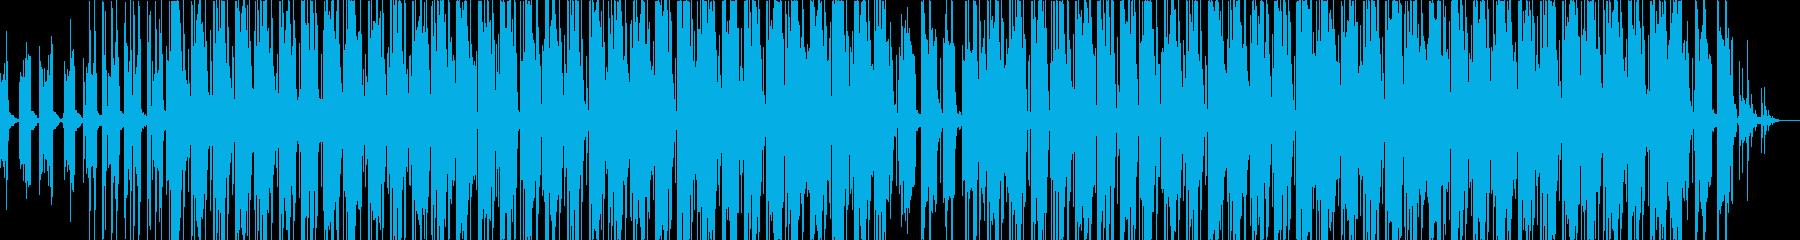 R&B/英語/お洒落/洋楽の再生済みの波形